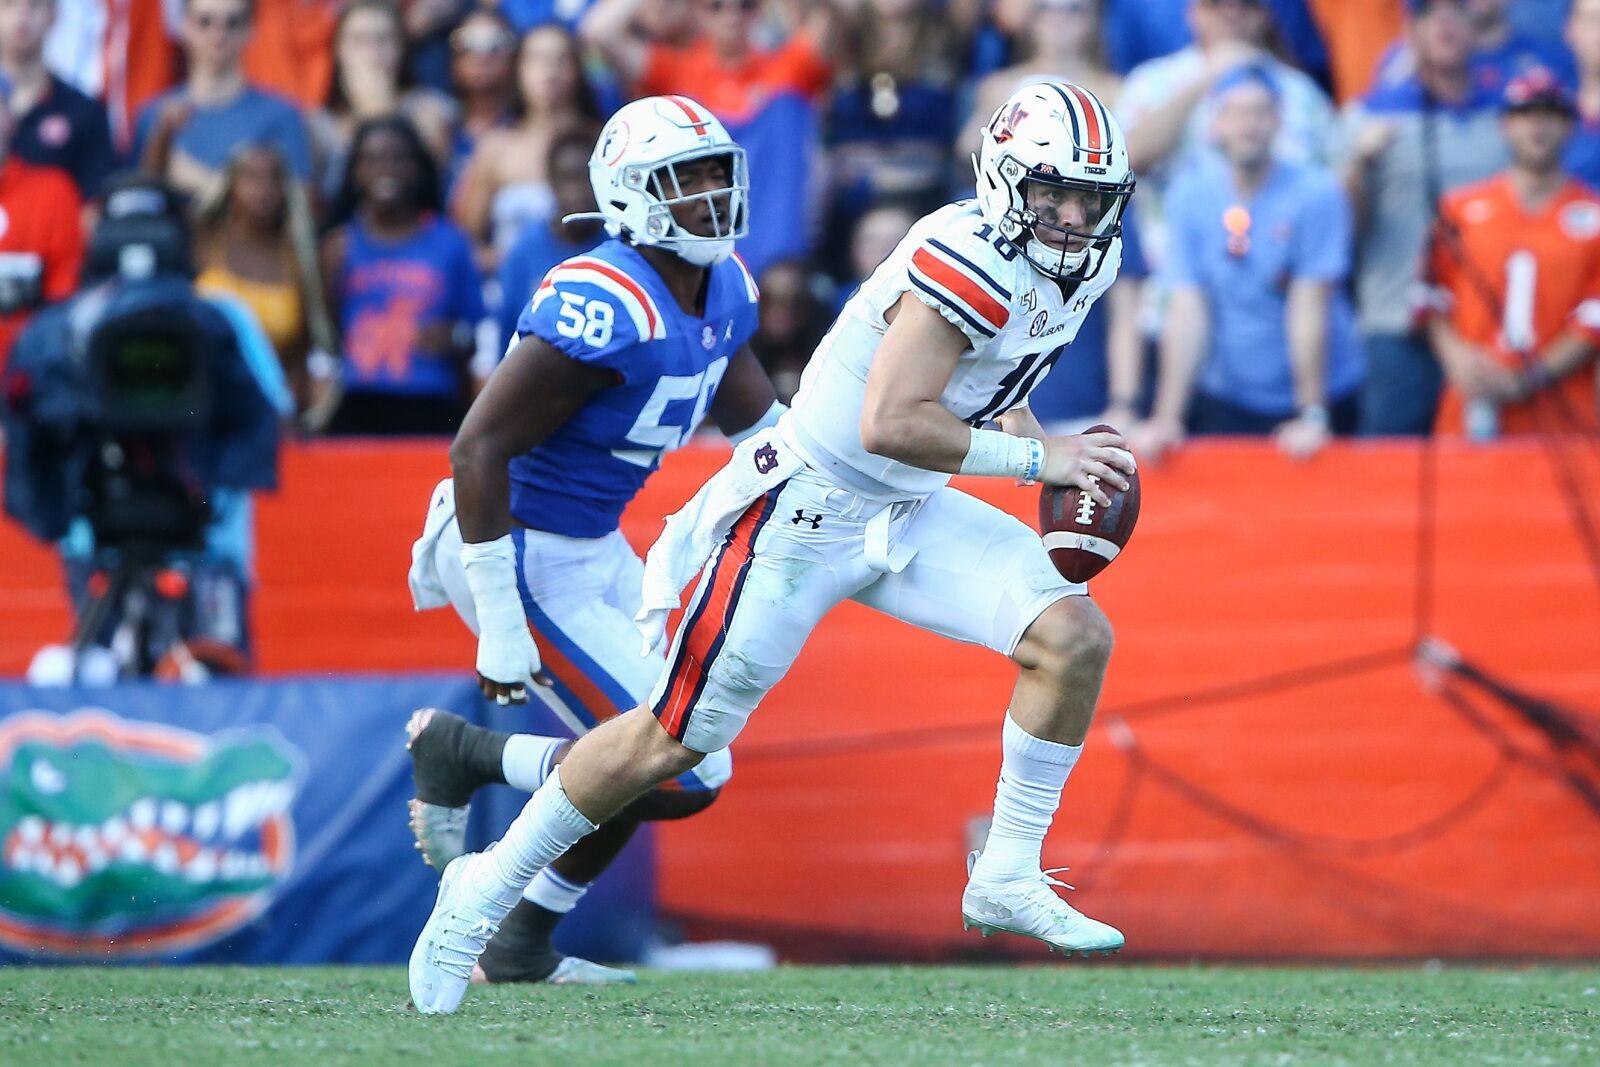 Florida football: 5 Gators to watch Saturday against LSU